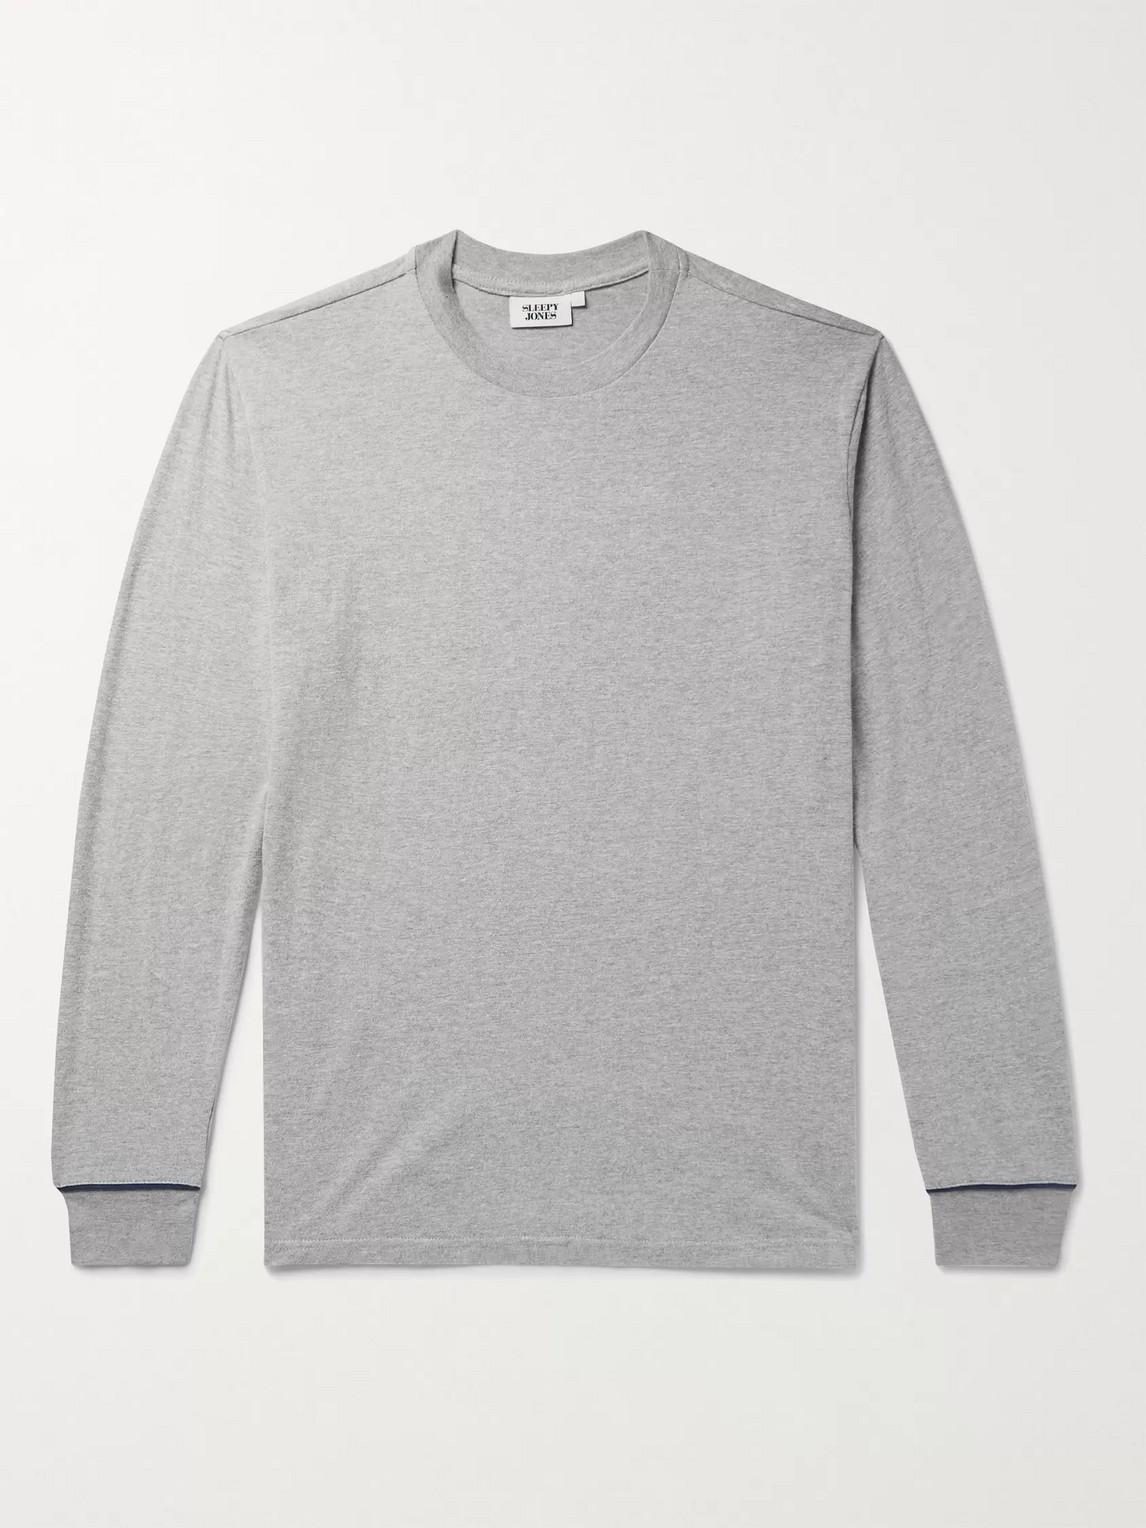 sleepy jones - powell cotton-blend jersey pyjama t-shirt - men - gray